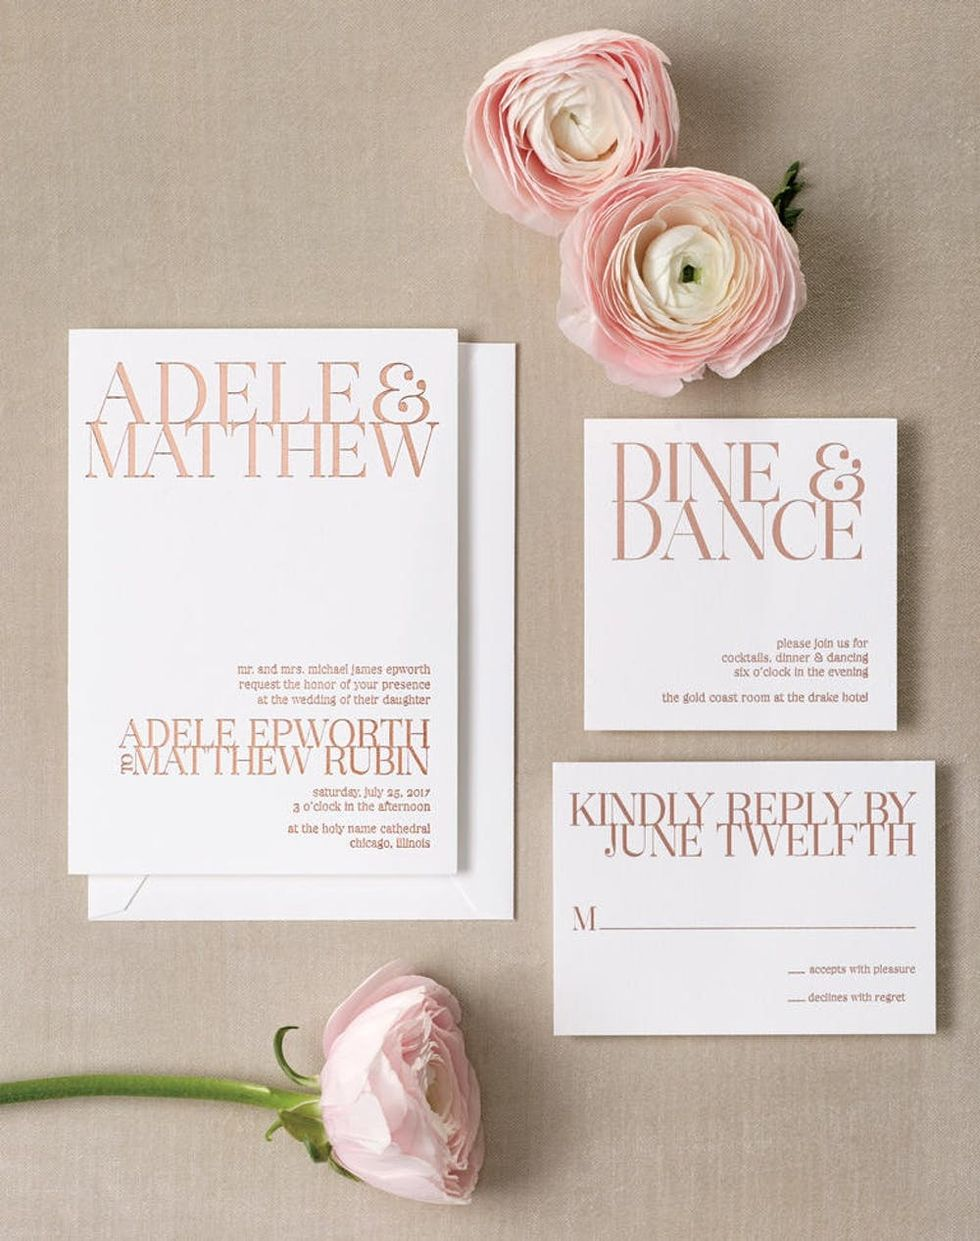 15 Super Chic Minimalist Wedding Invites - Brit + Co